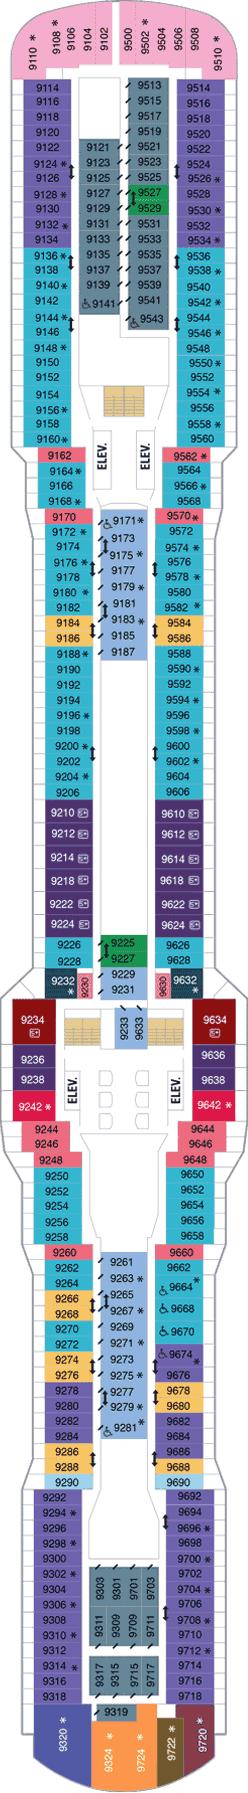 Ovation Of The Seas Null Deck Plan